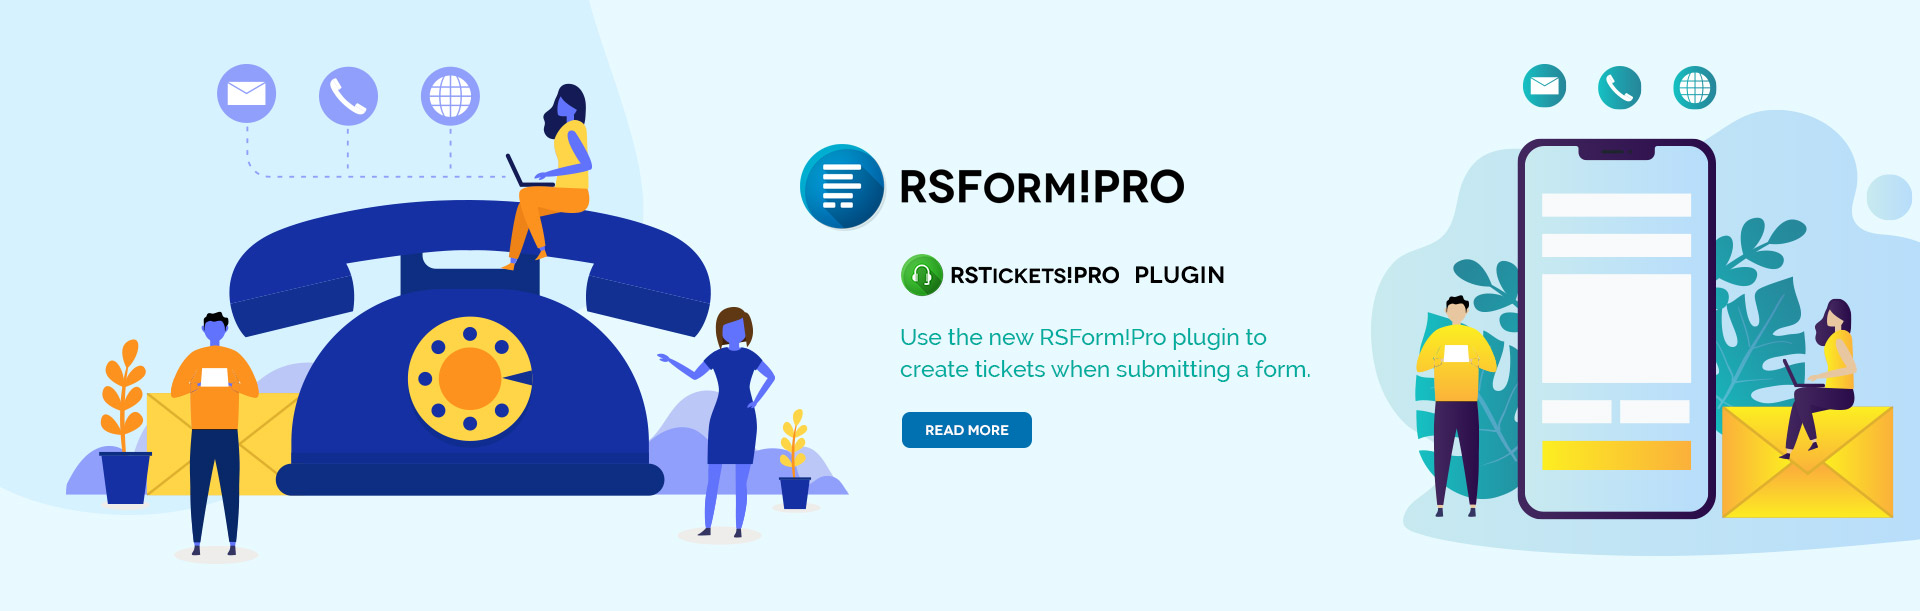 RSForm!Pro RSTickets!Pro plugin